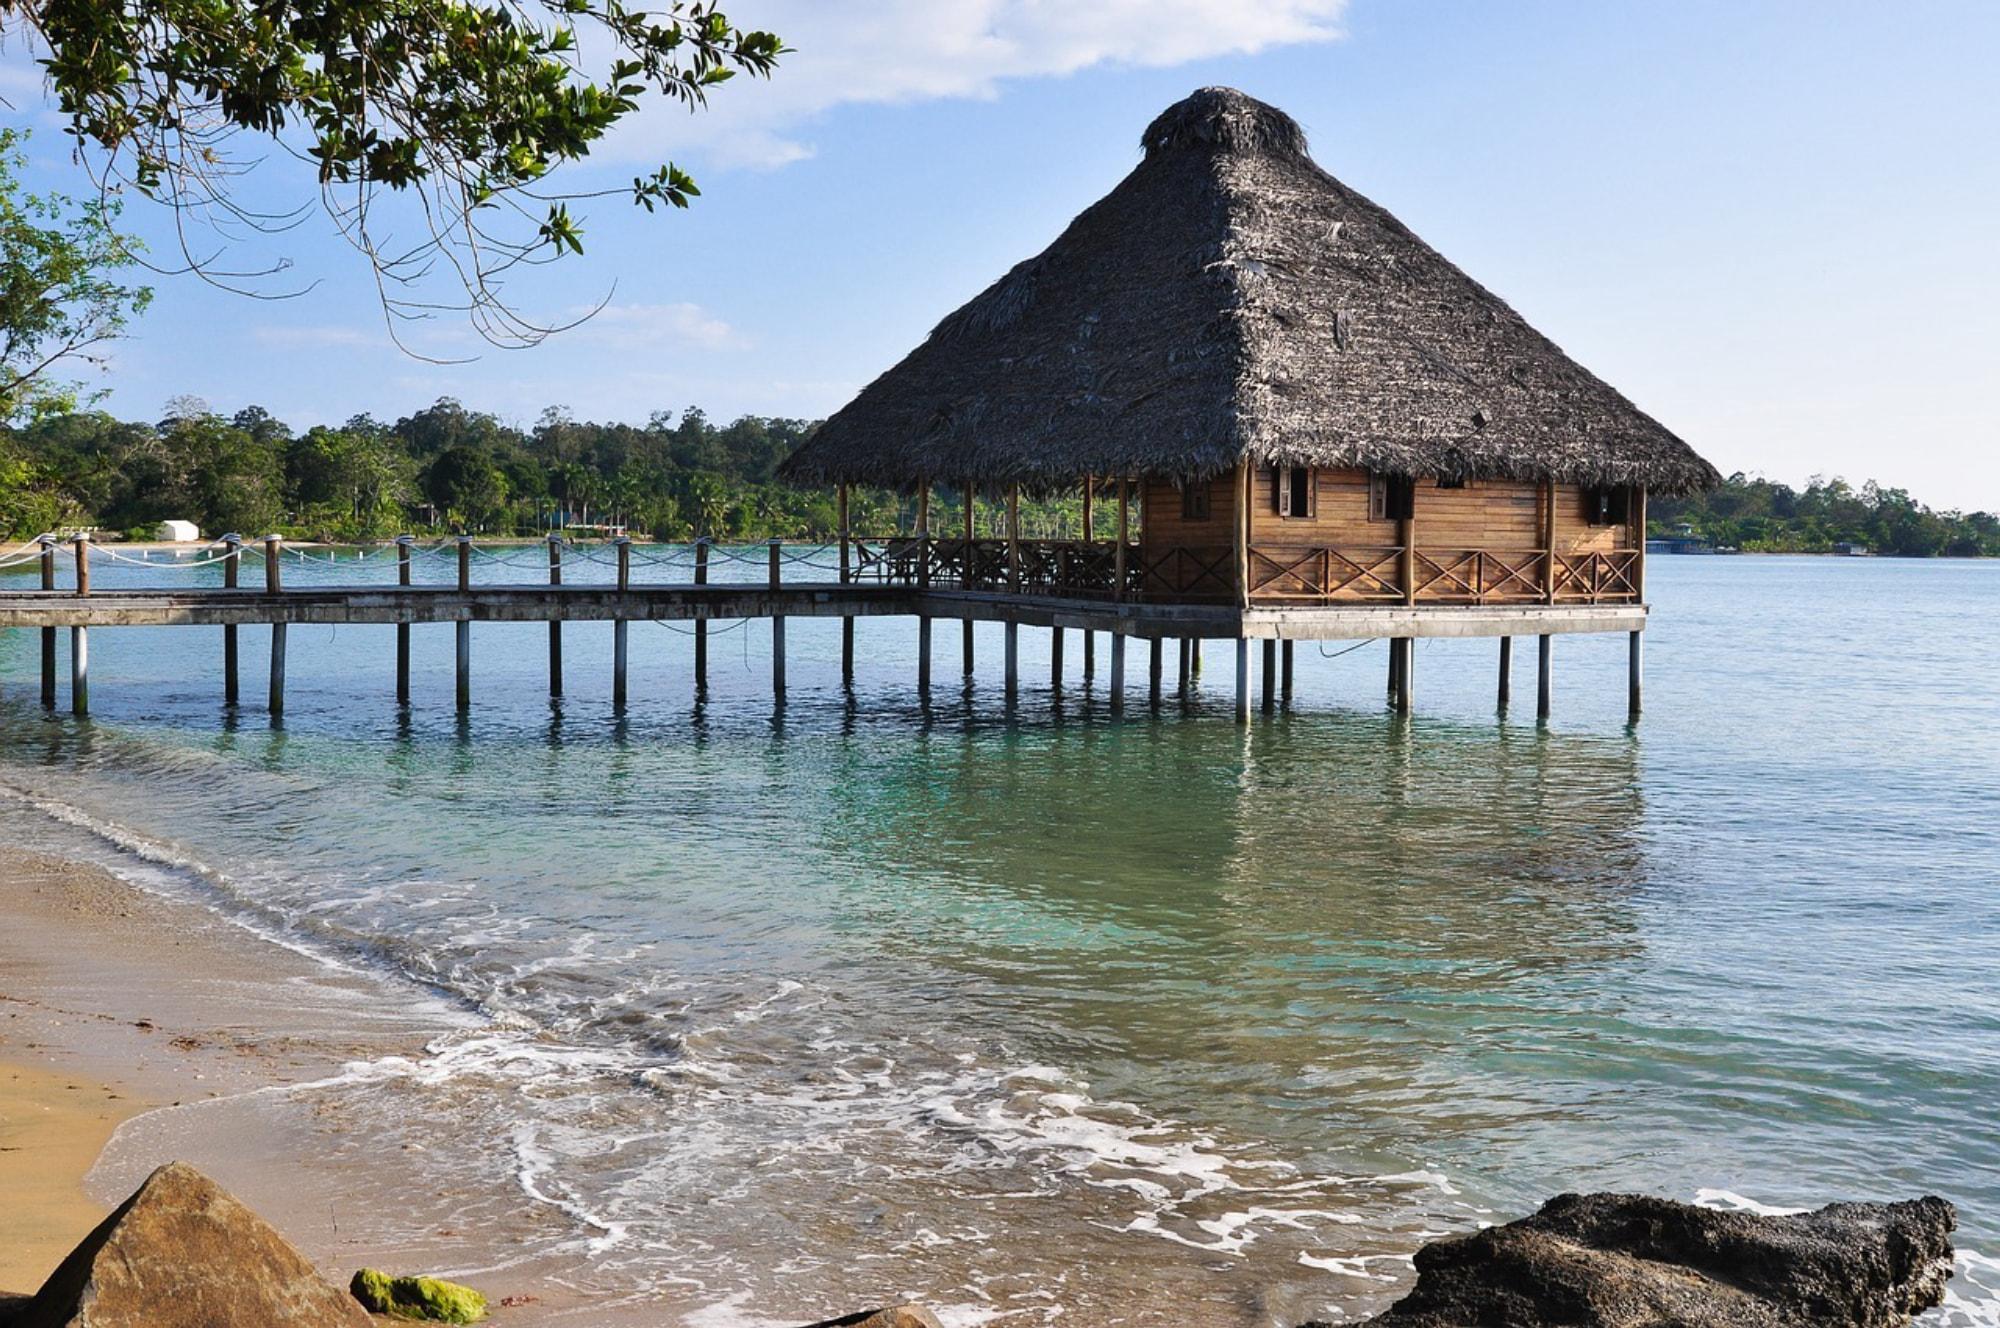 Getting to Bocas del Toro, Pamana